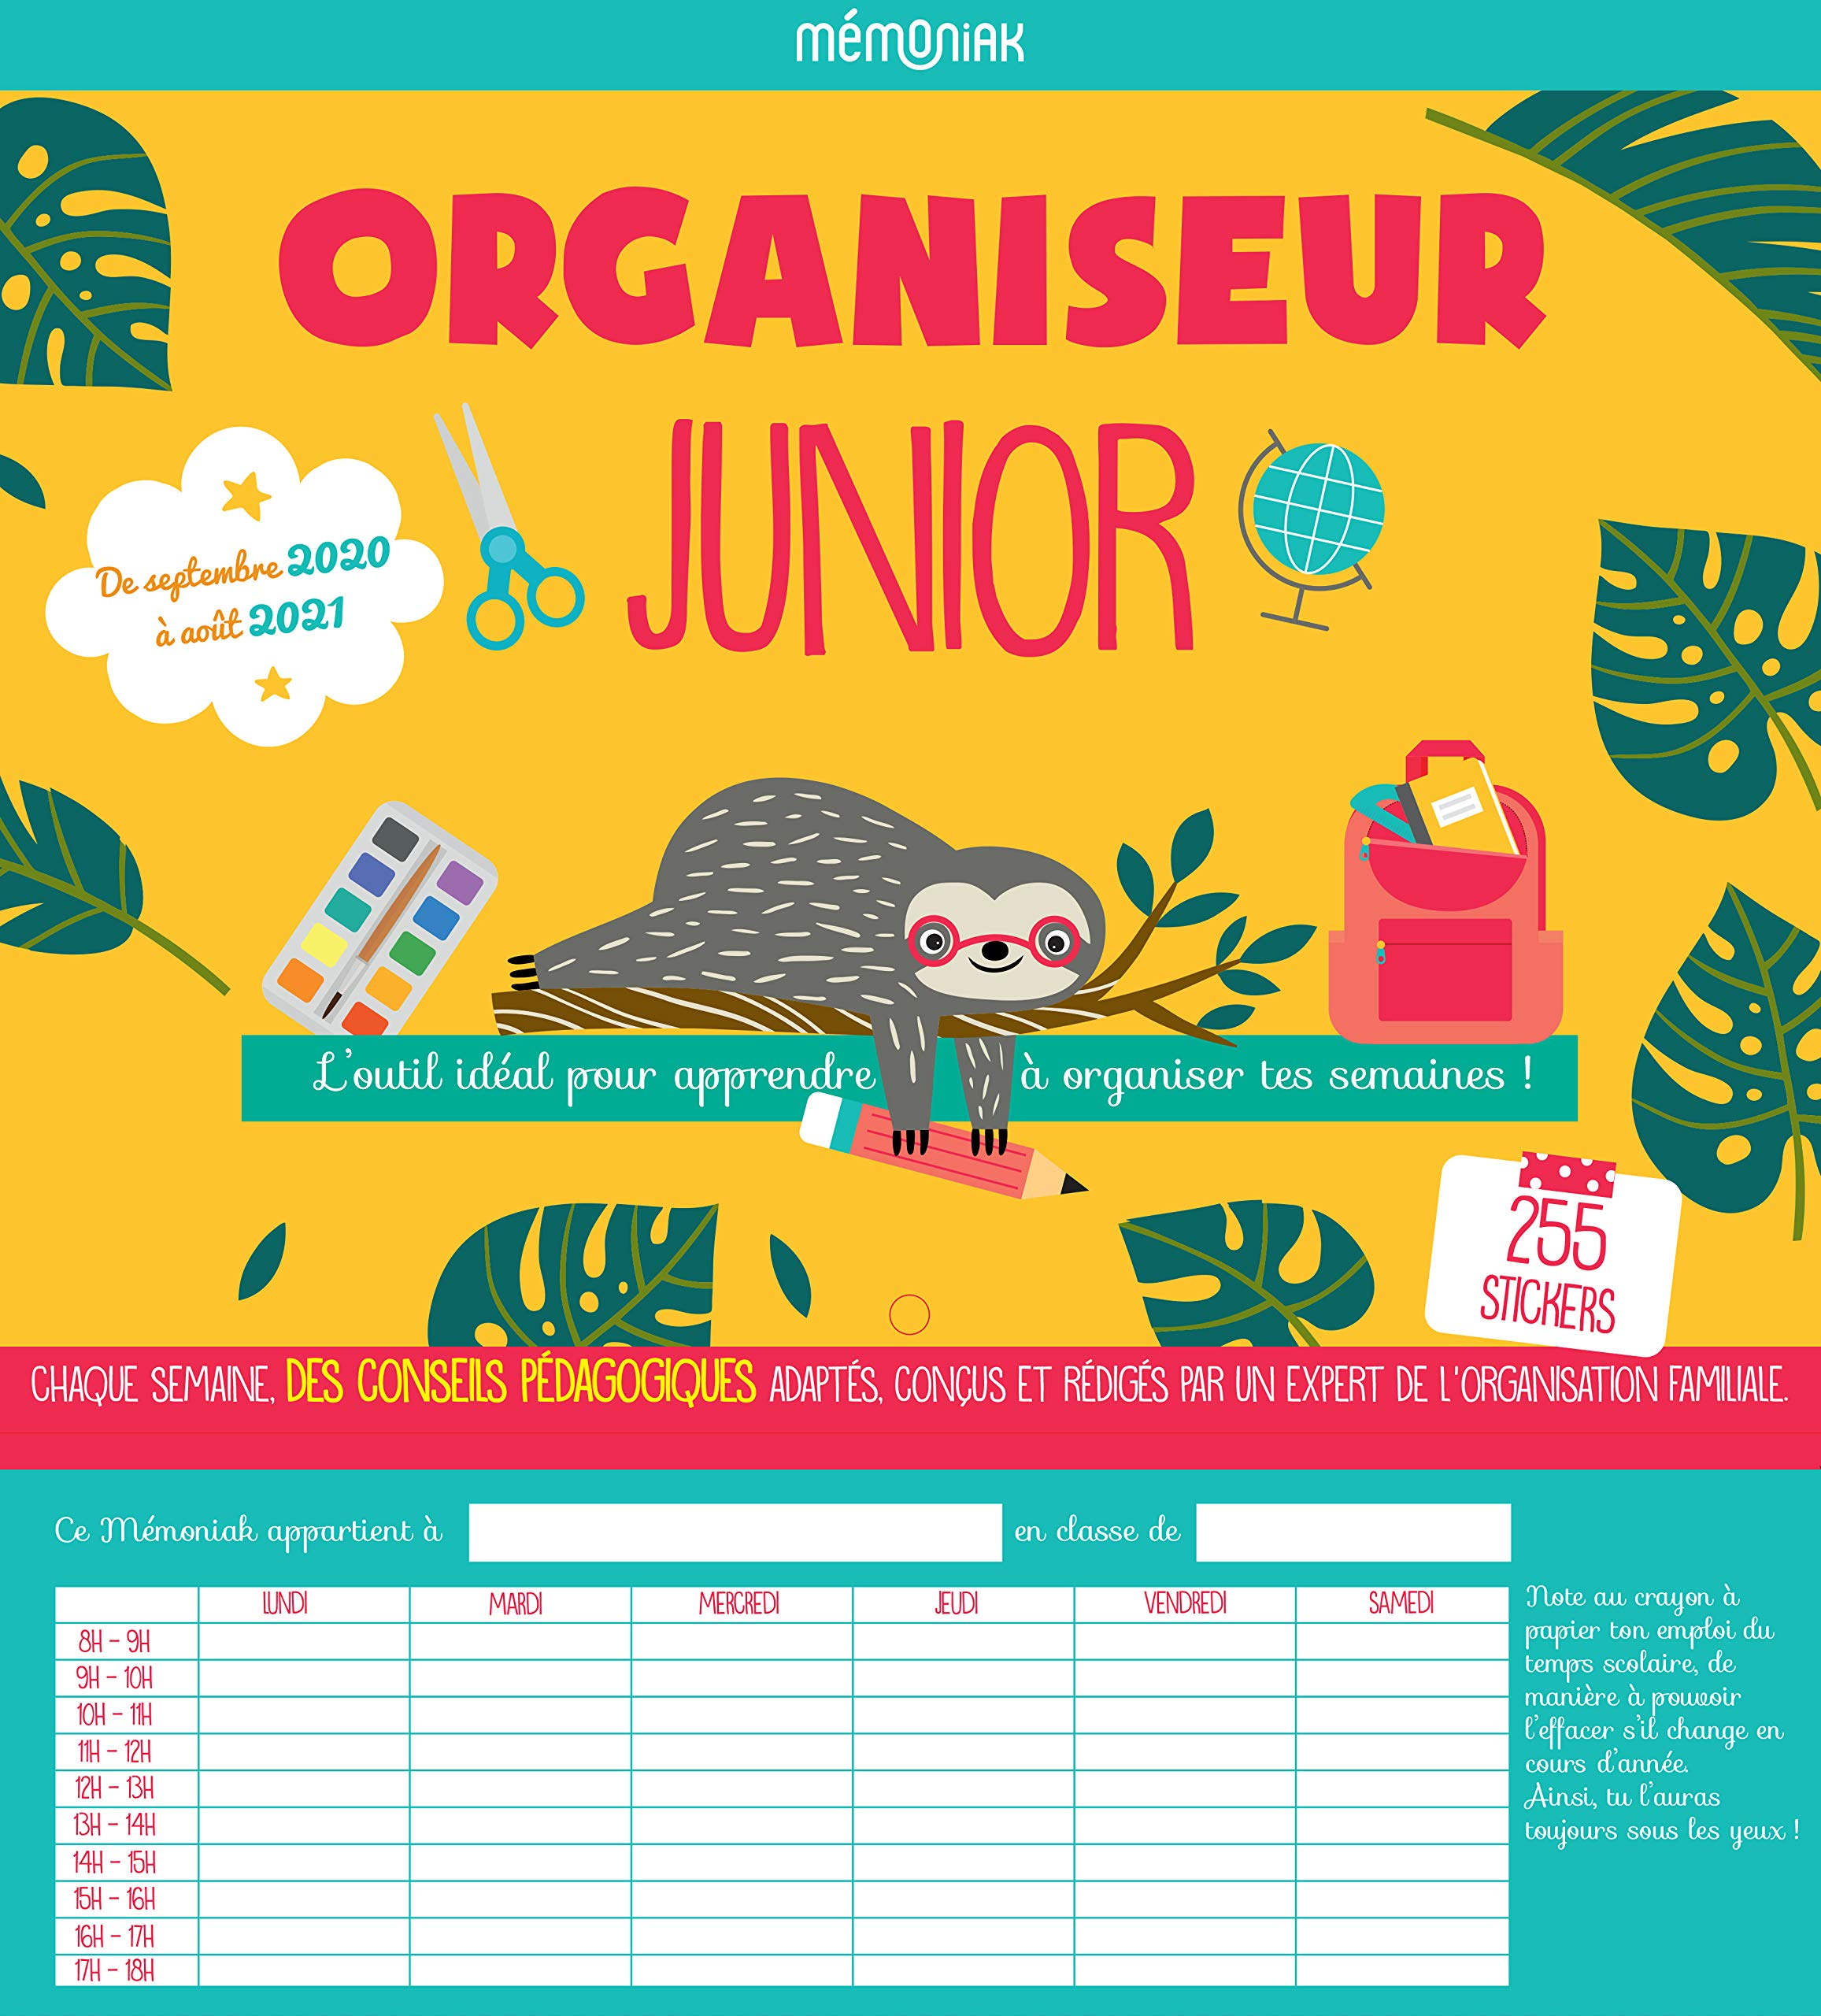 Organiseur Junior Mémoniak 2020 2021 (CALENDRIERS ENFANTS MEMONIAK